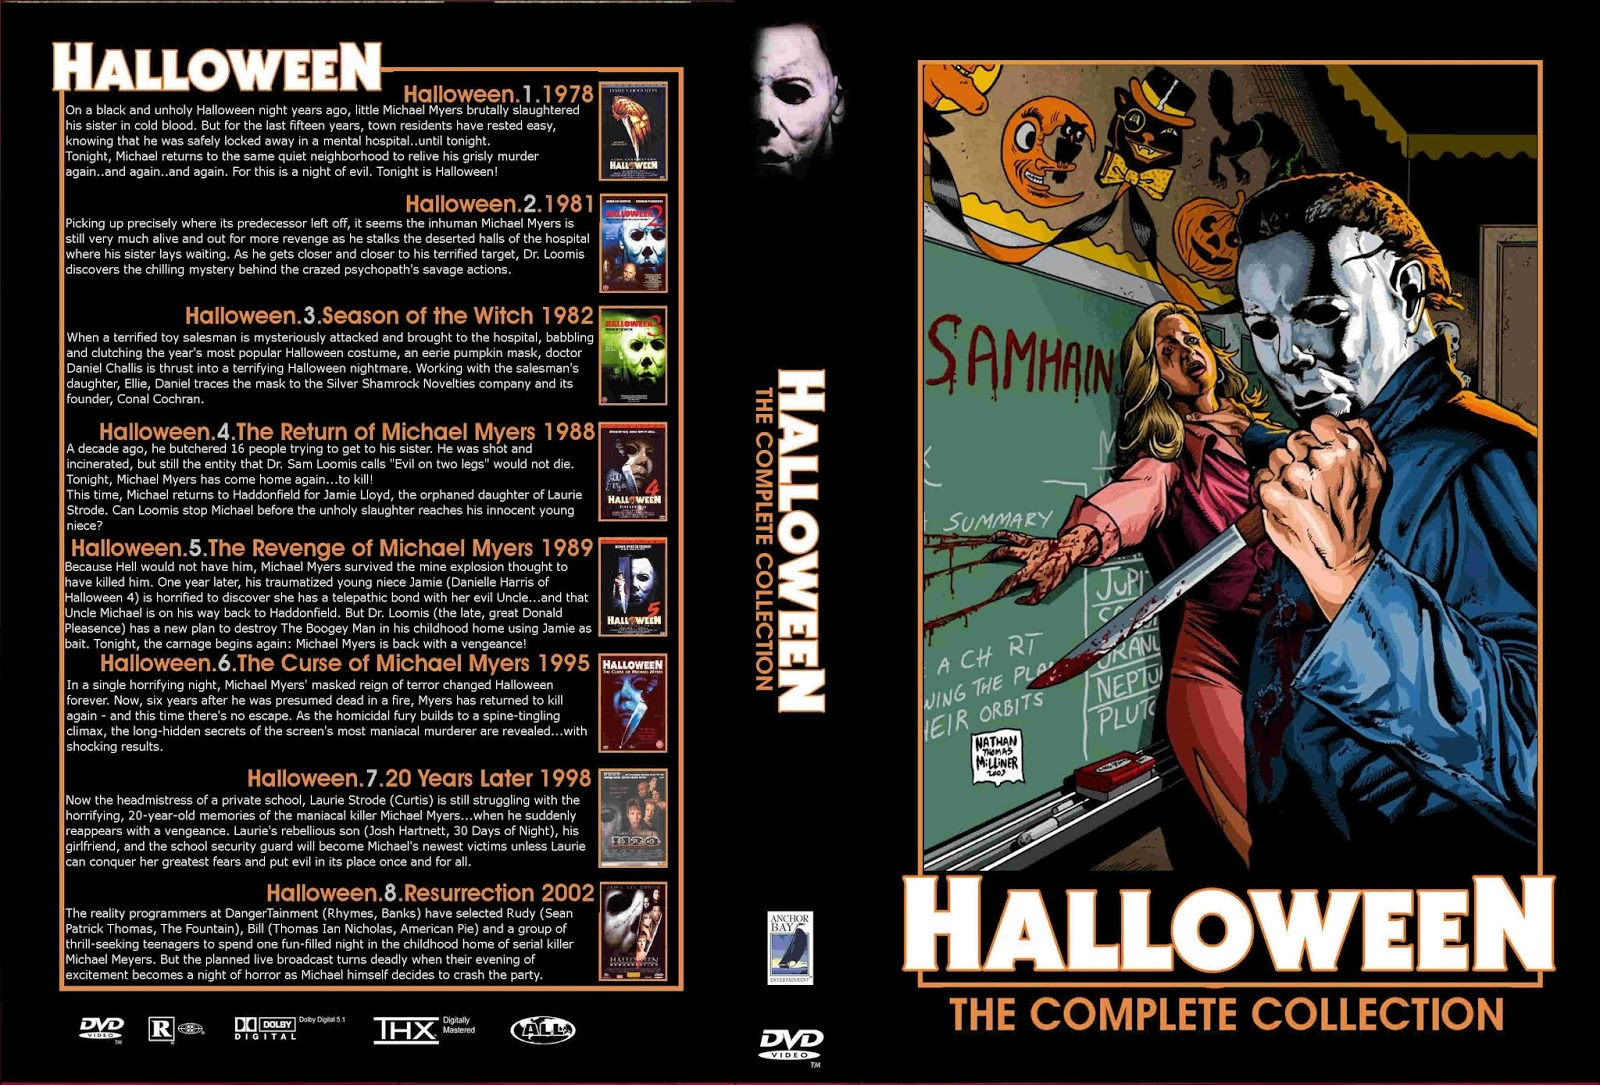 Halloween Dvd Box Set.Halloween Dvd Cover Zozogame Co